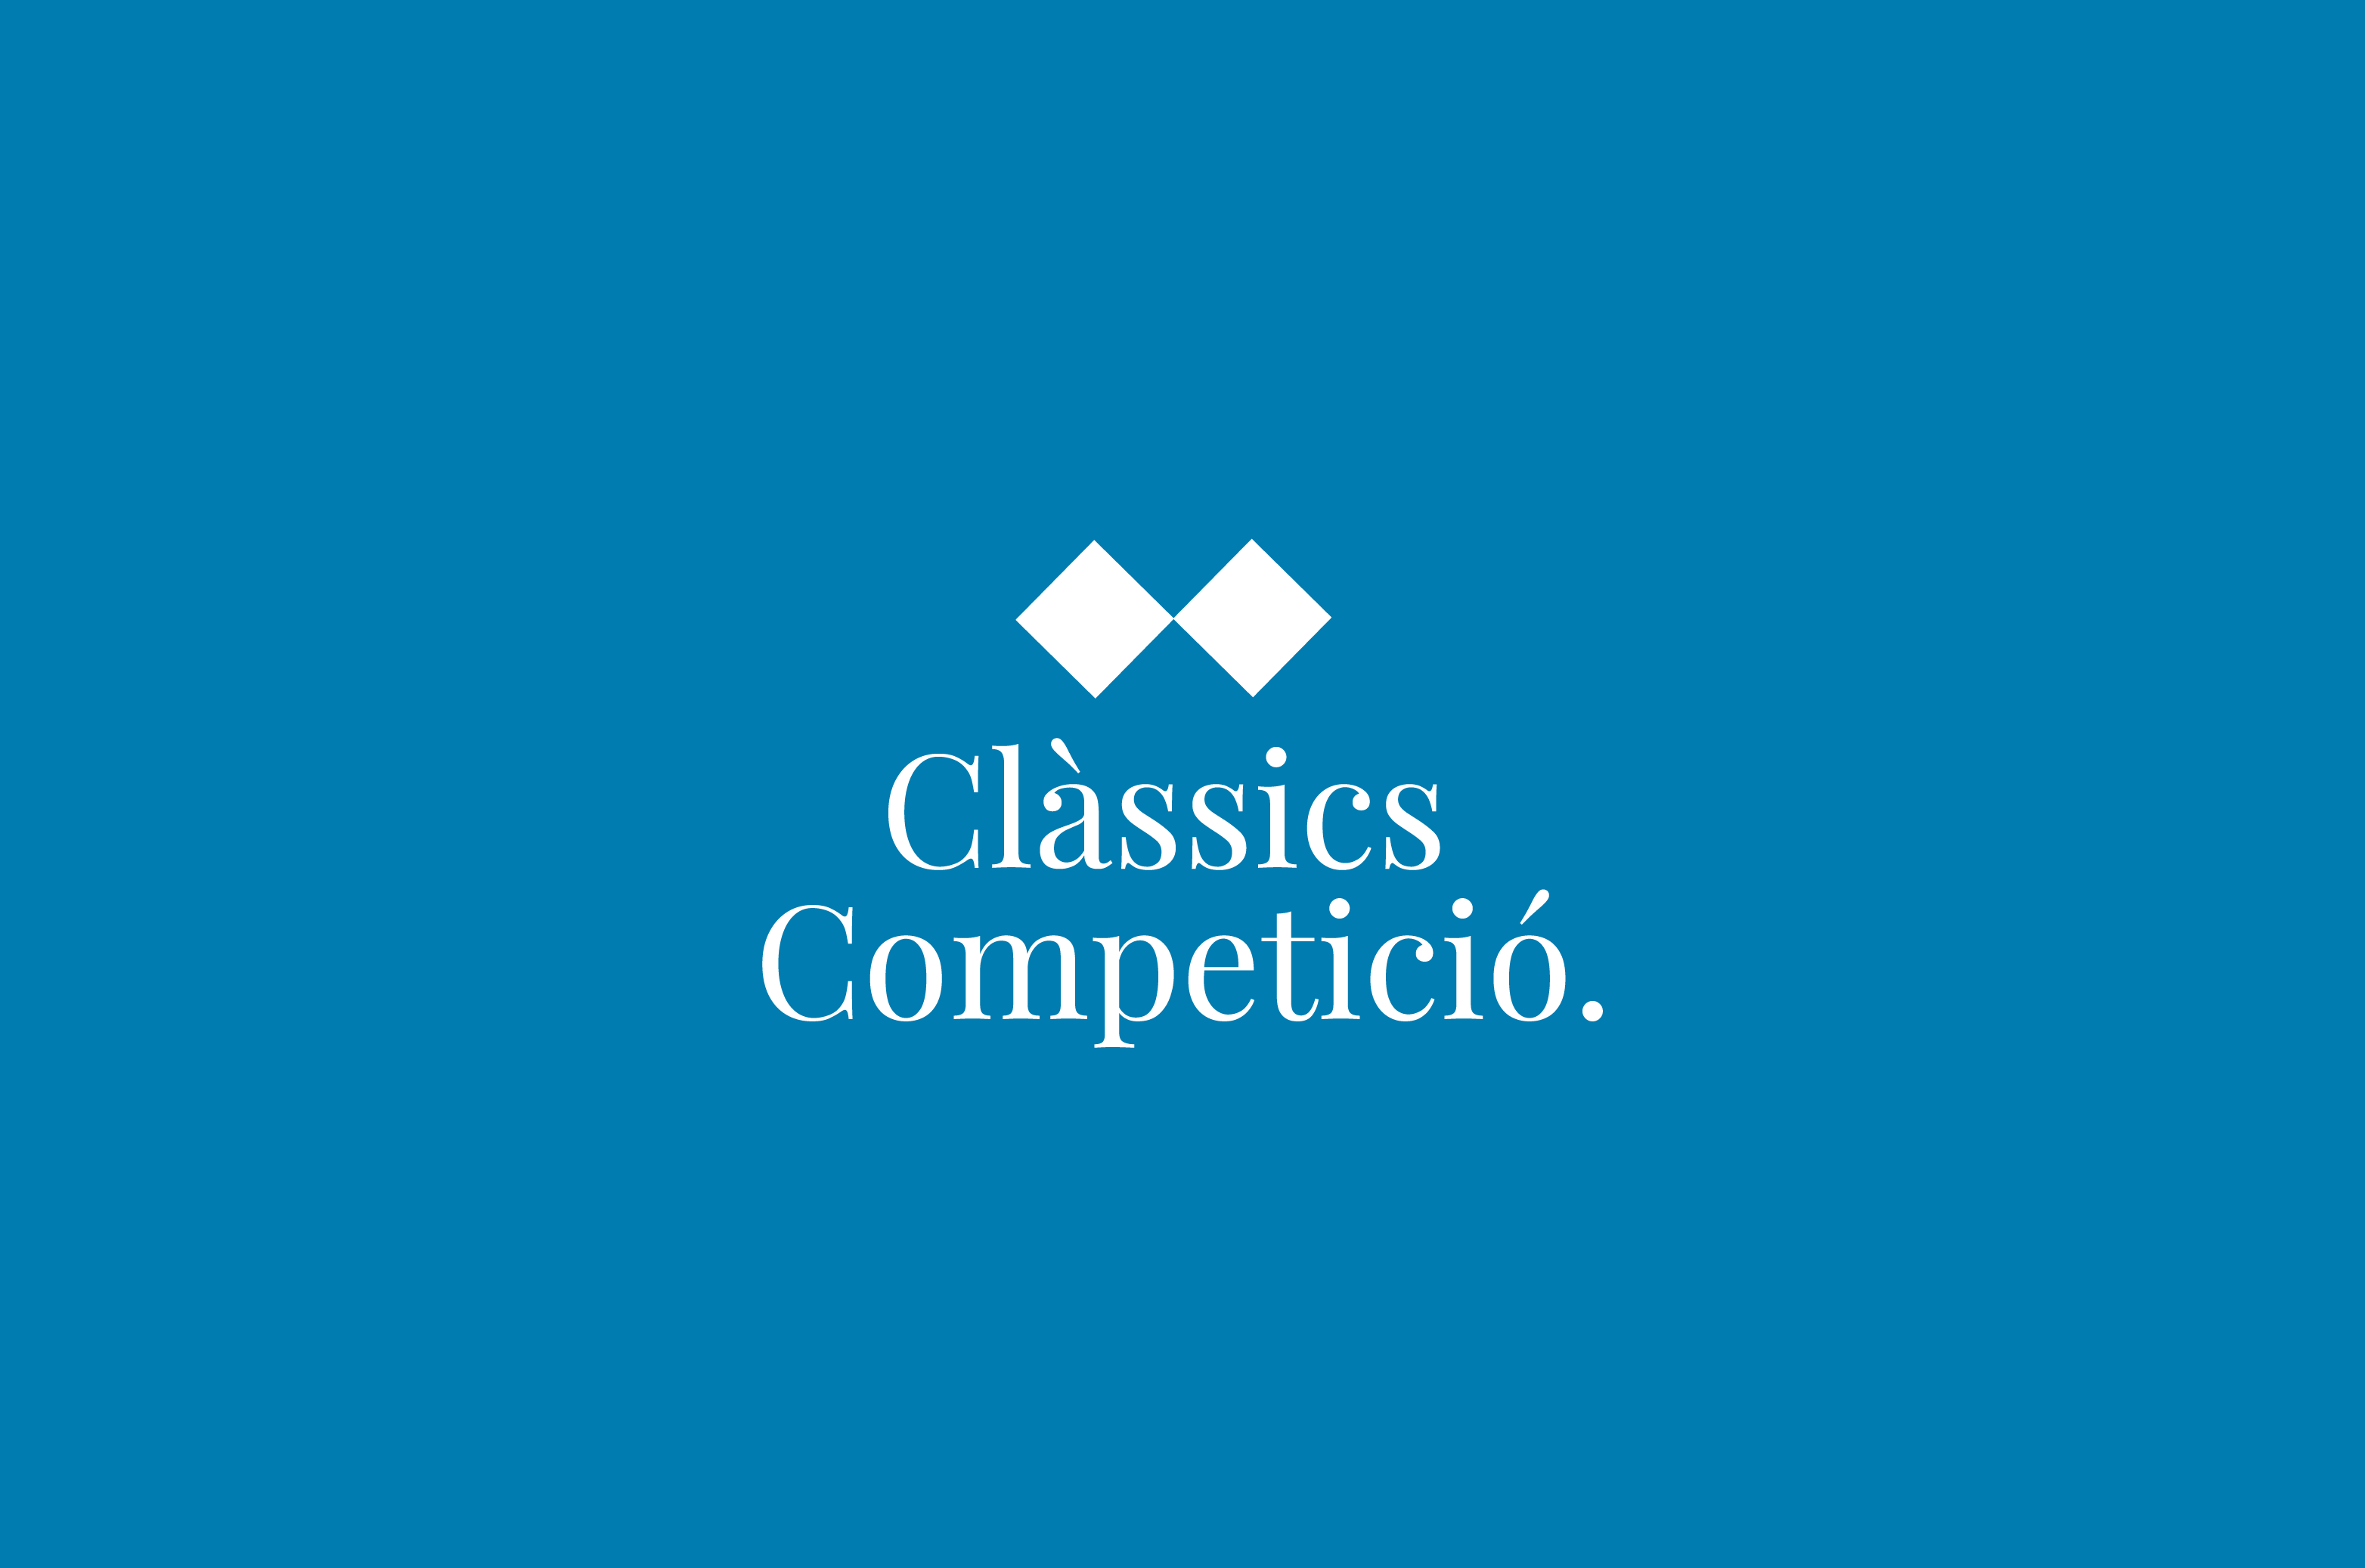 ClassicsCompeticio_Mesa de trabajo 1